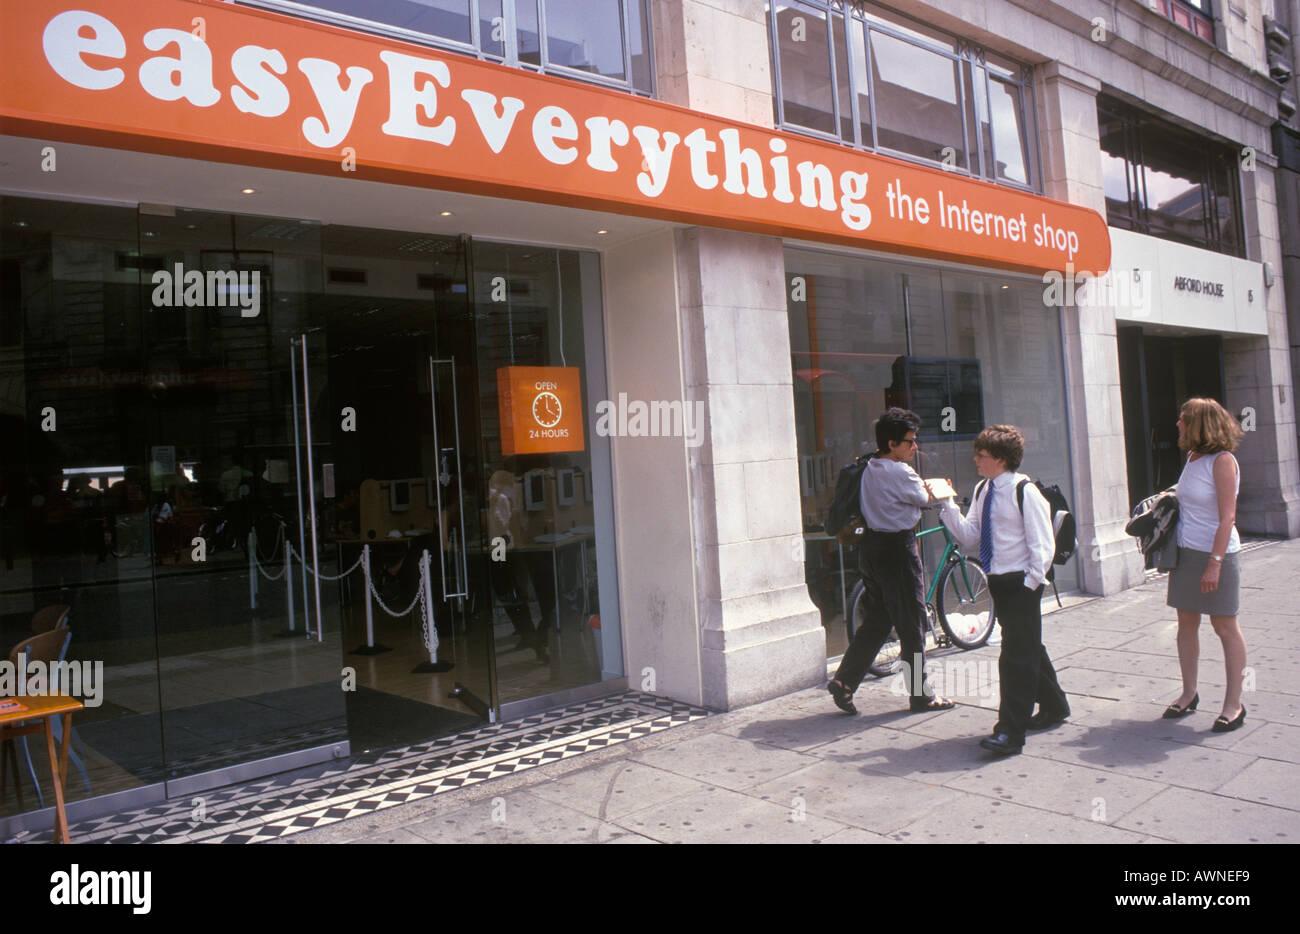 Easy Everything Internet café Victoria London England HOMER SYKES - Stock Image